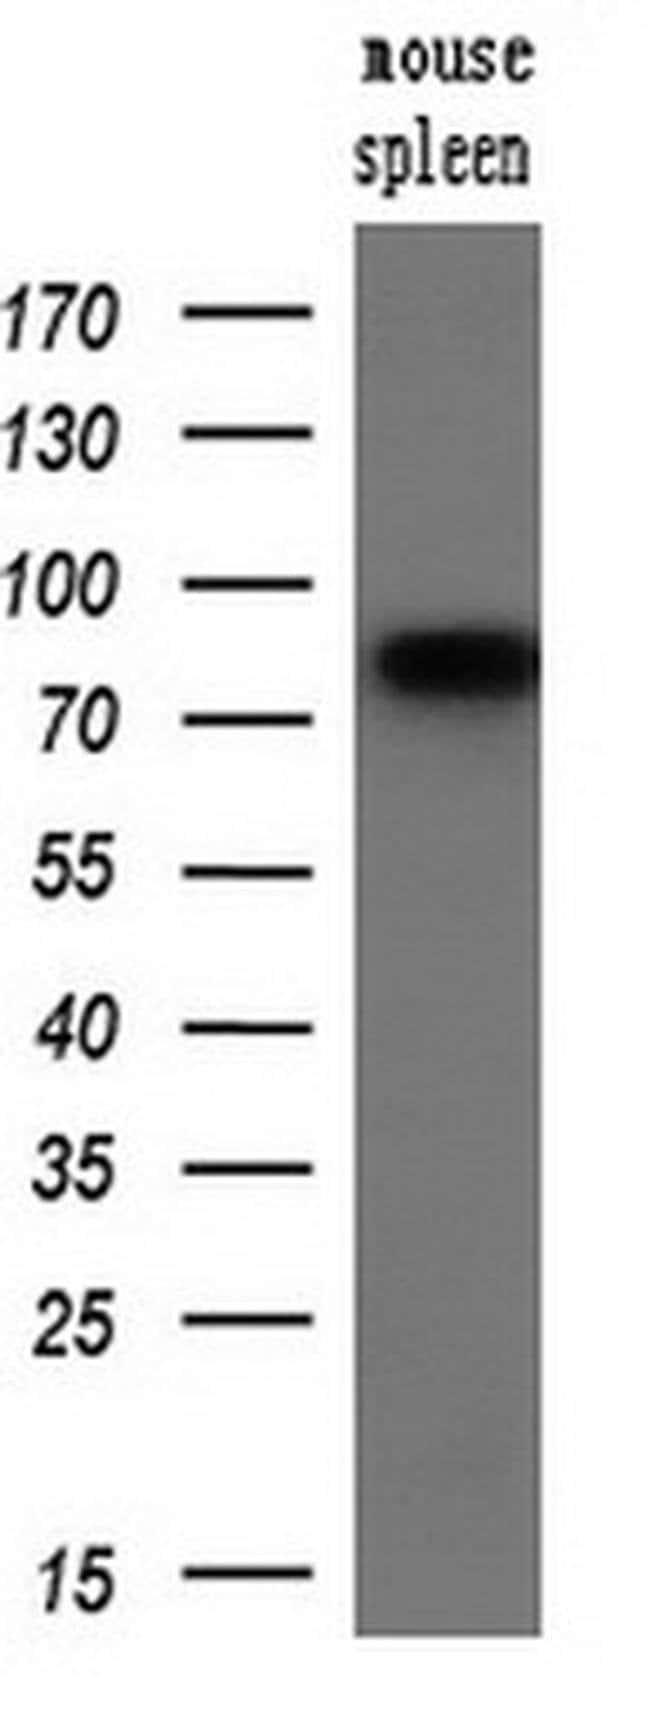 SAMHD1 Mouse anti-Canine, Human, Mouse, Rat, Clone: OTI1A1, liquid, TrueMAB